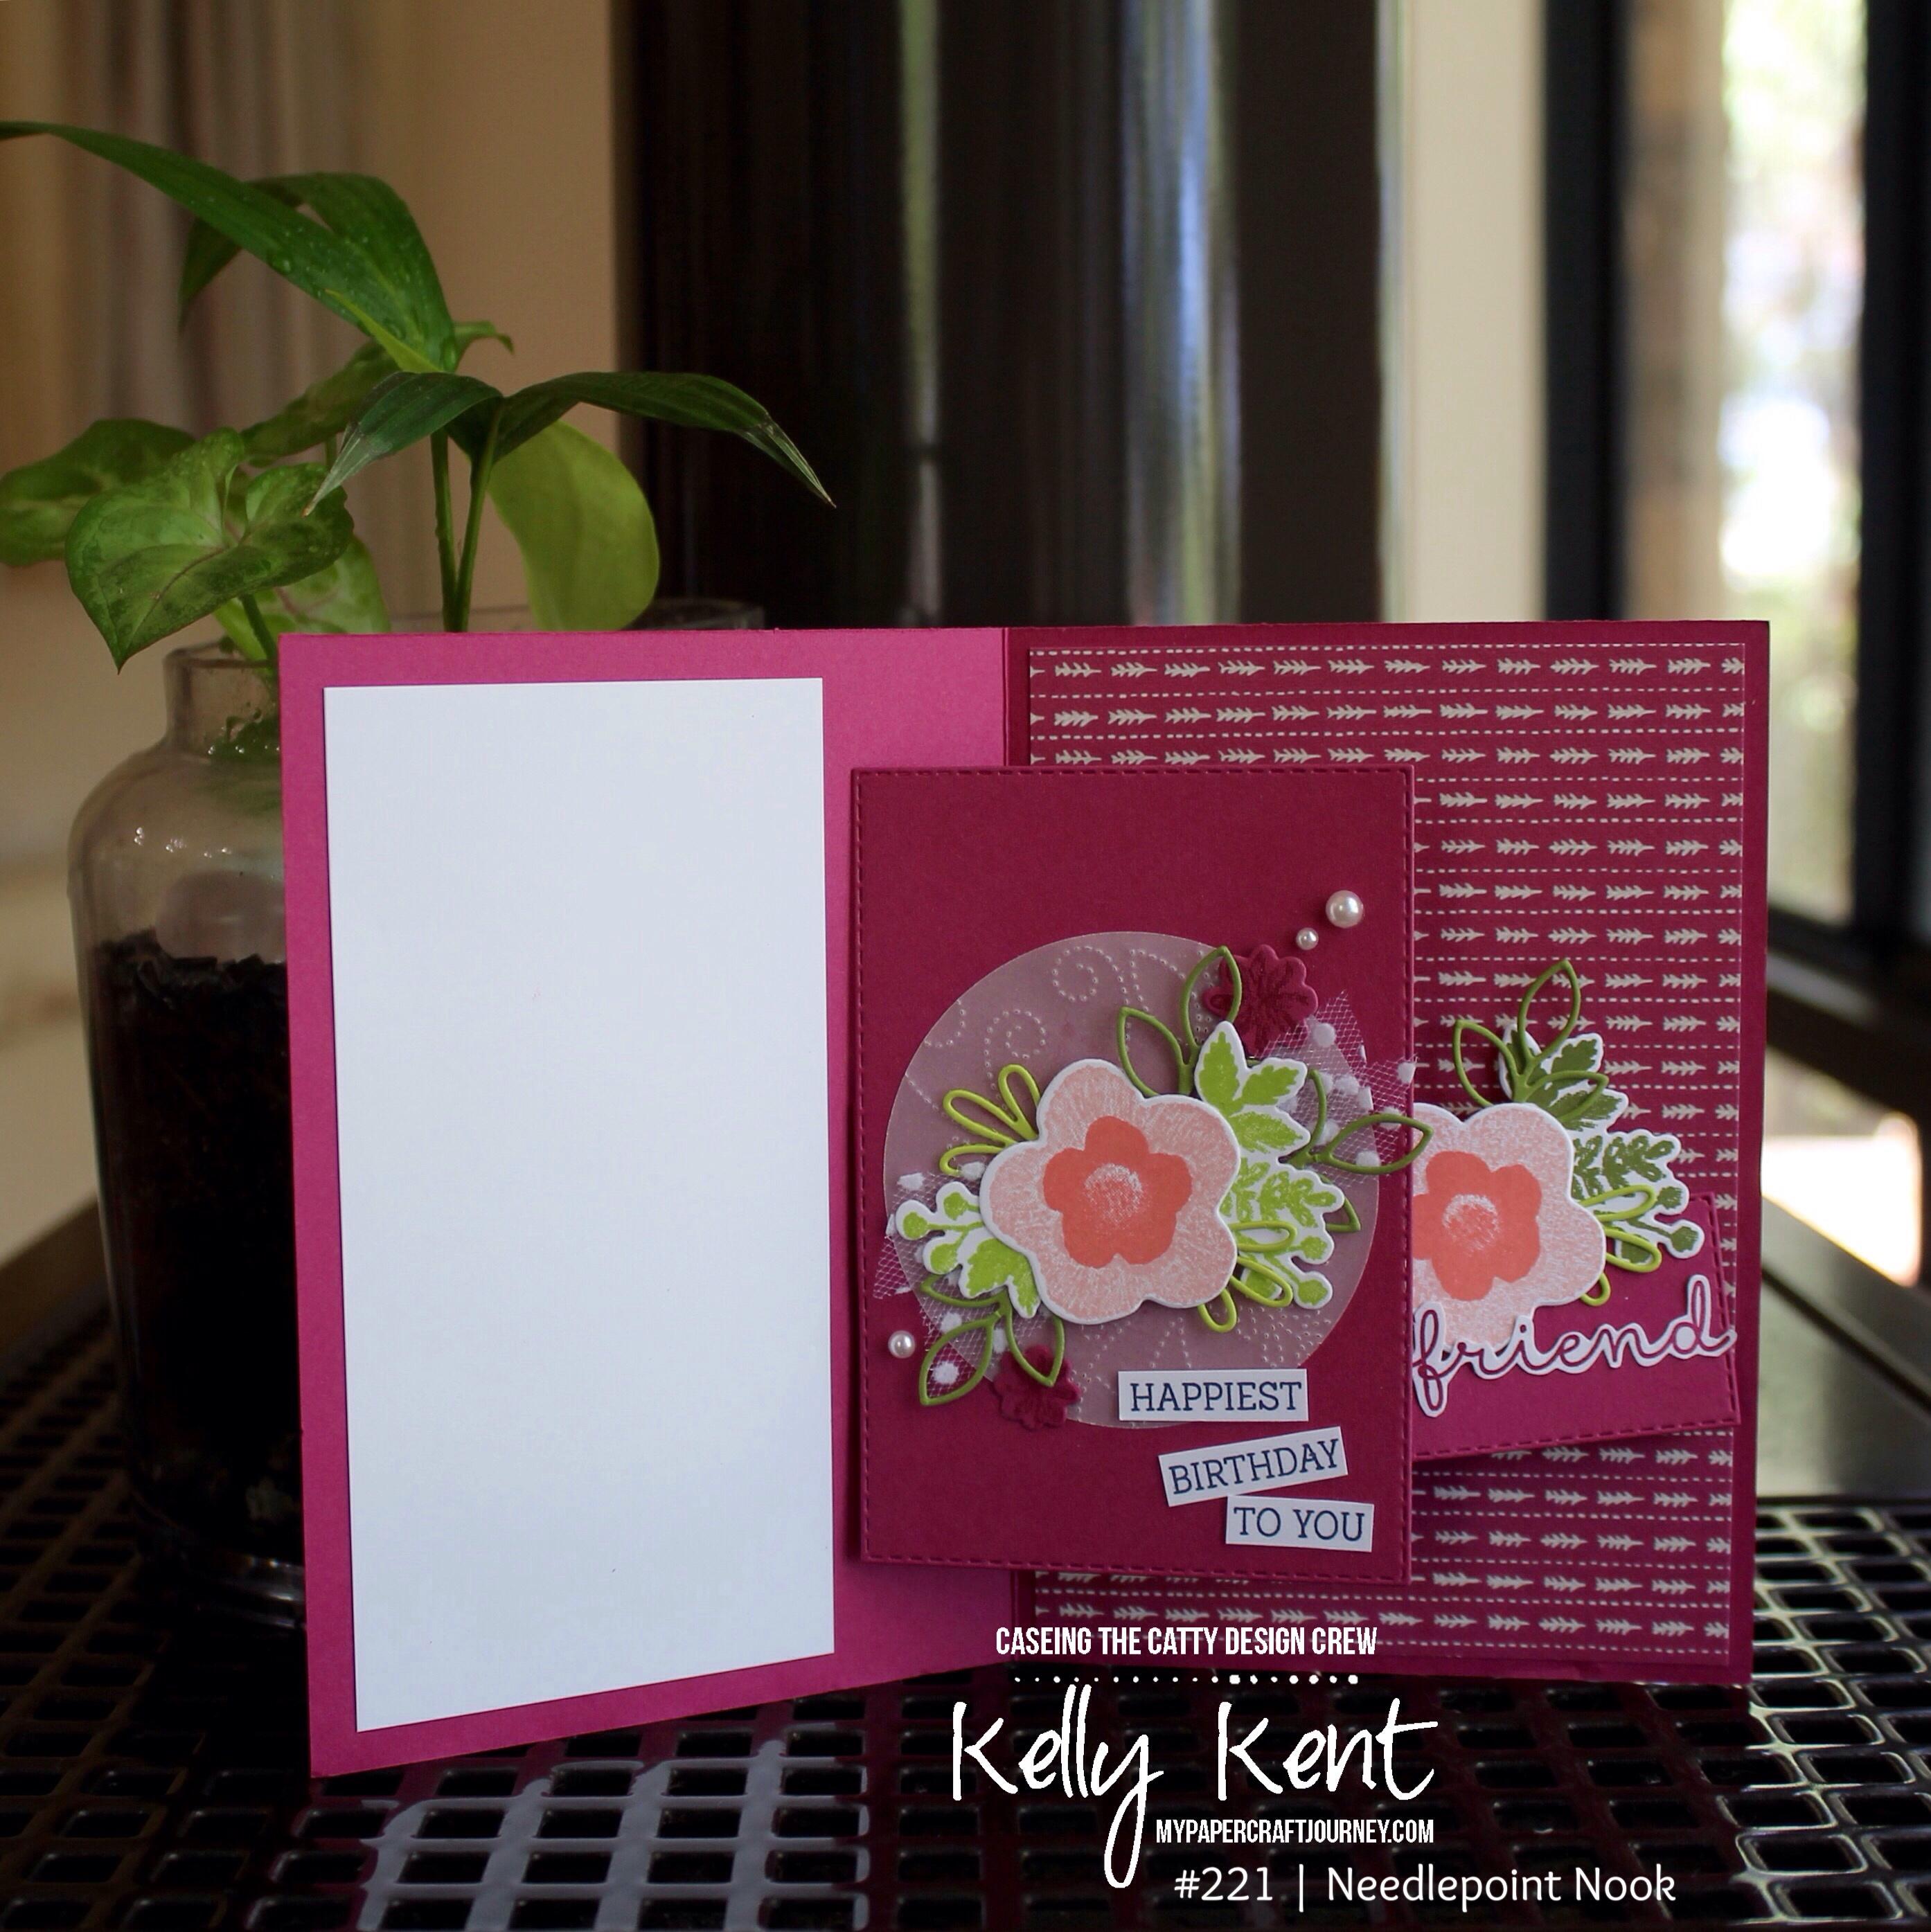 Needlepoint Nook Spinner Pop Up Card | kelly kent